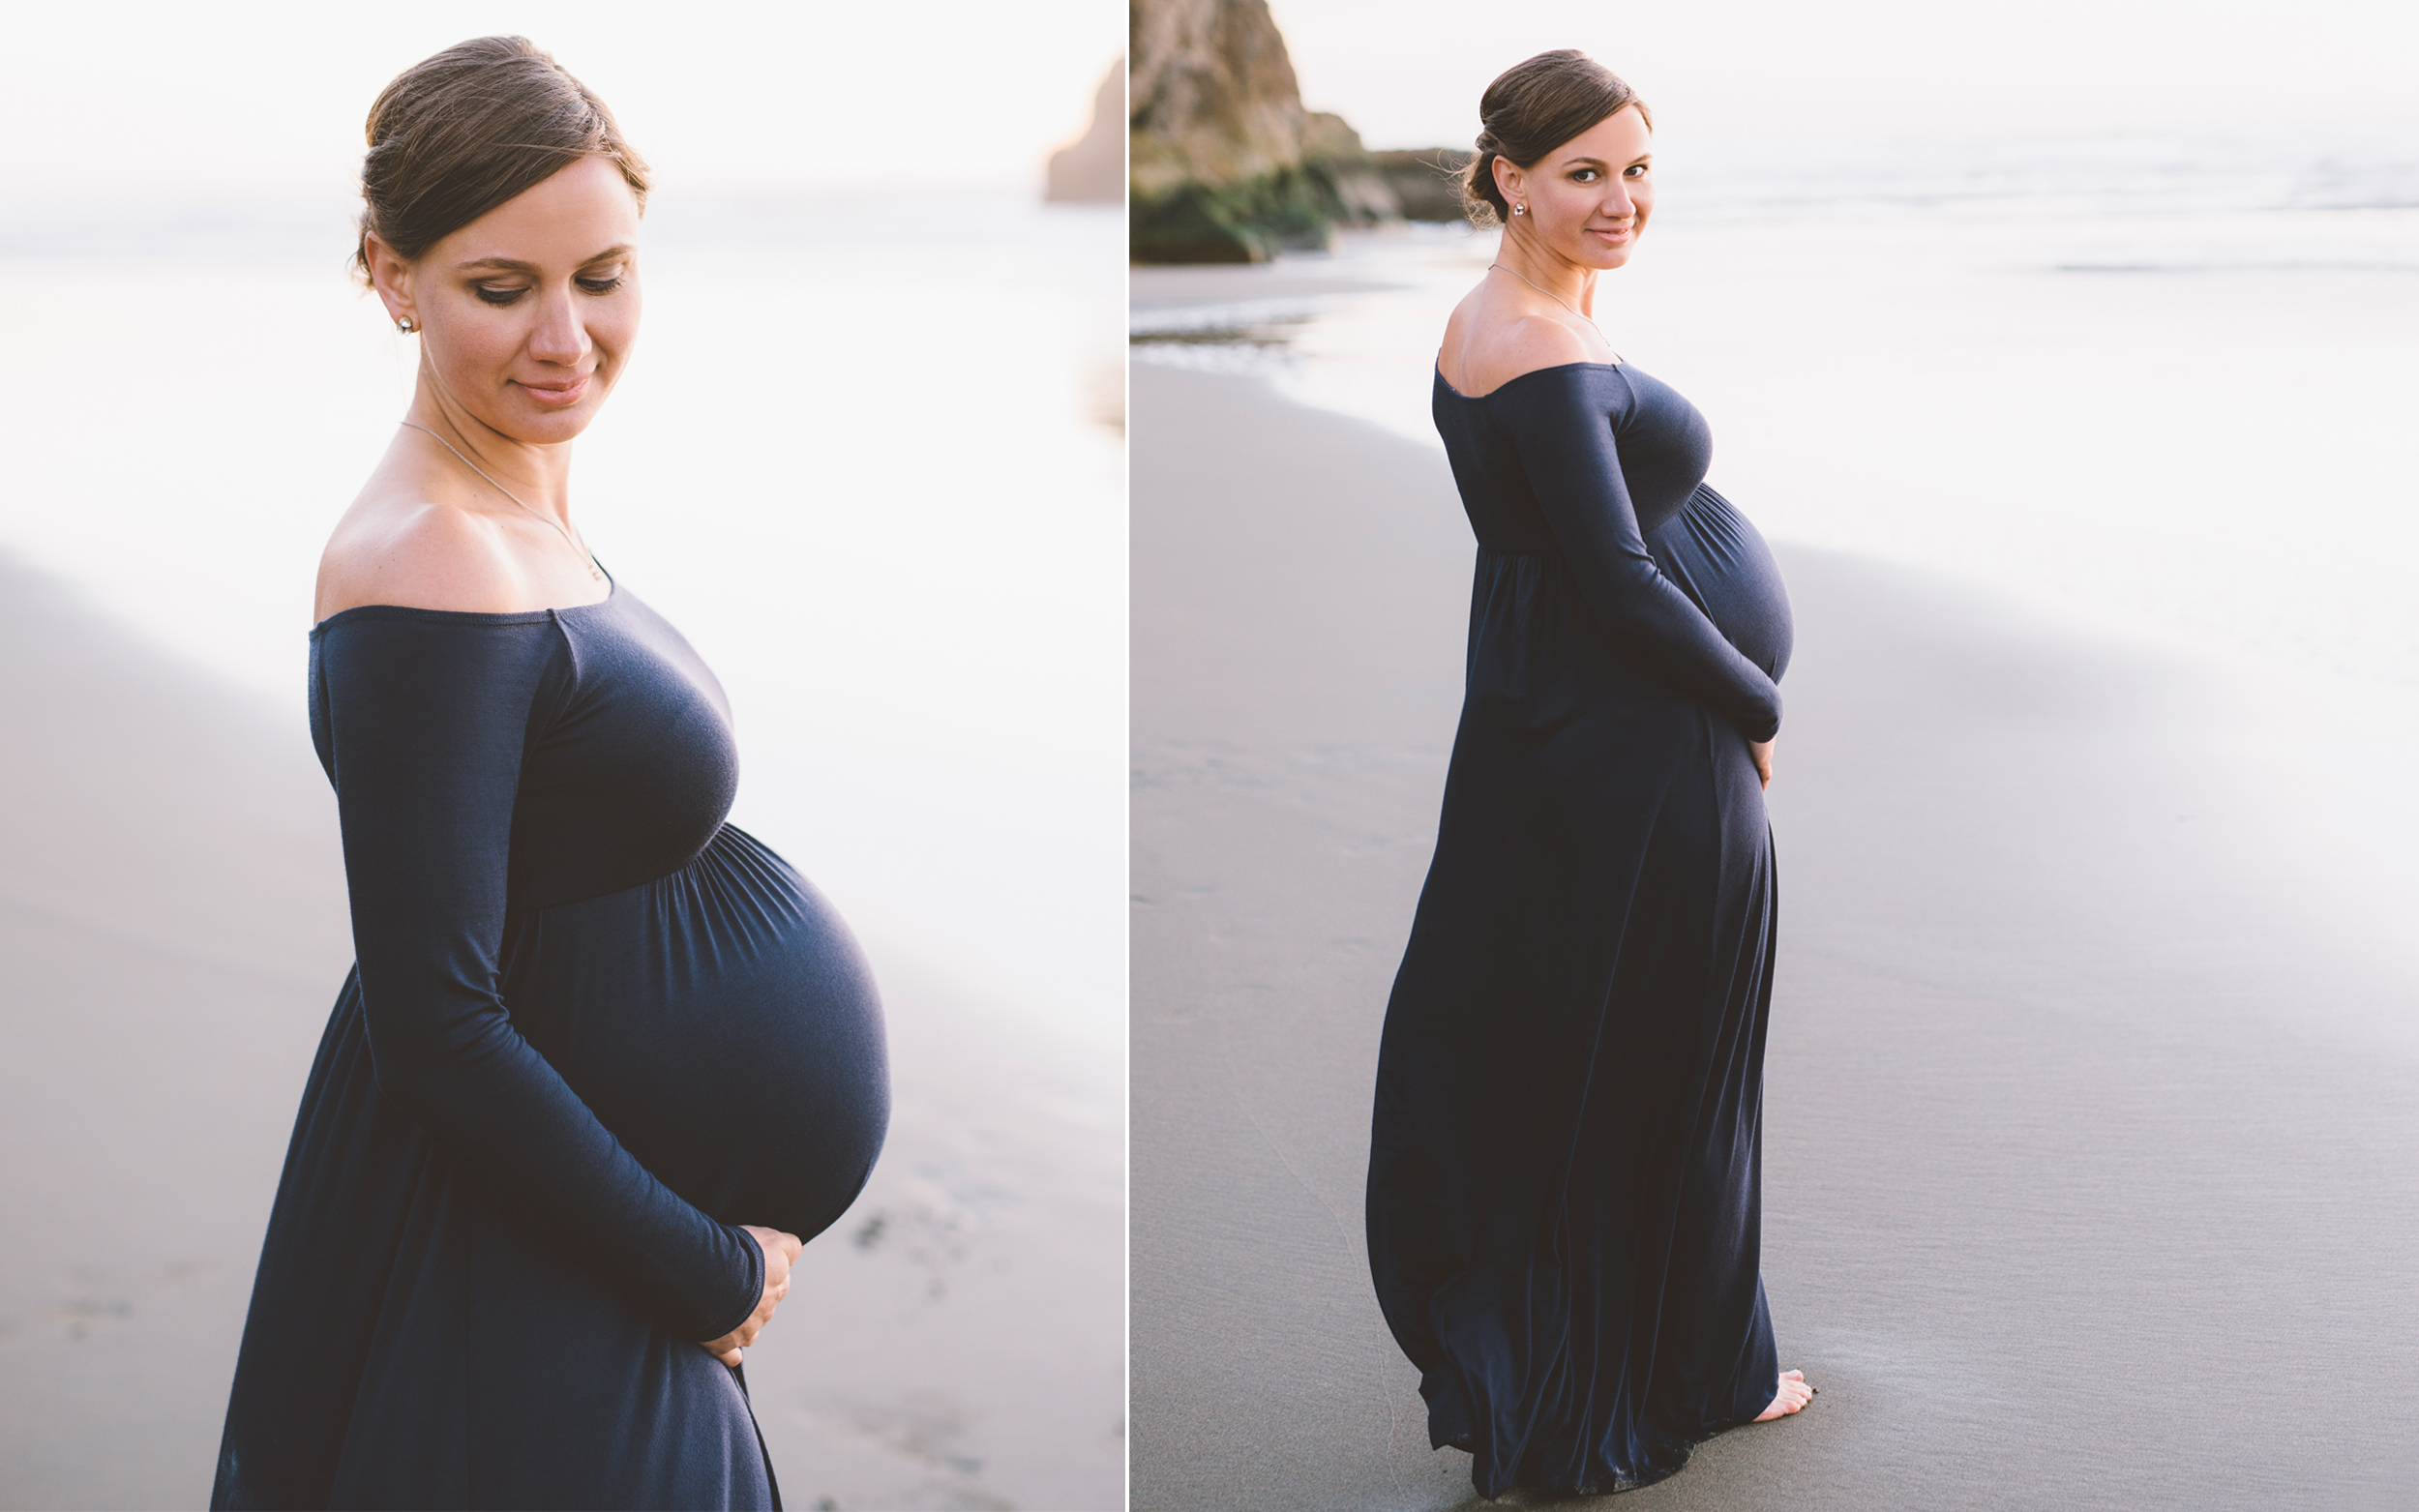 lands-end-beach-maternity-session.jpg